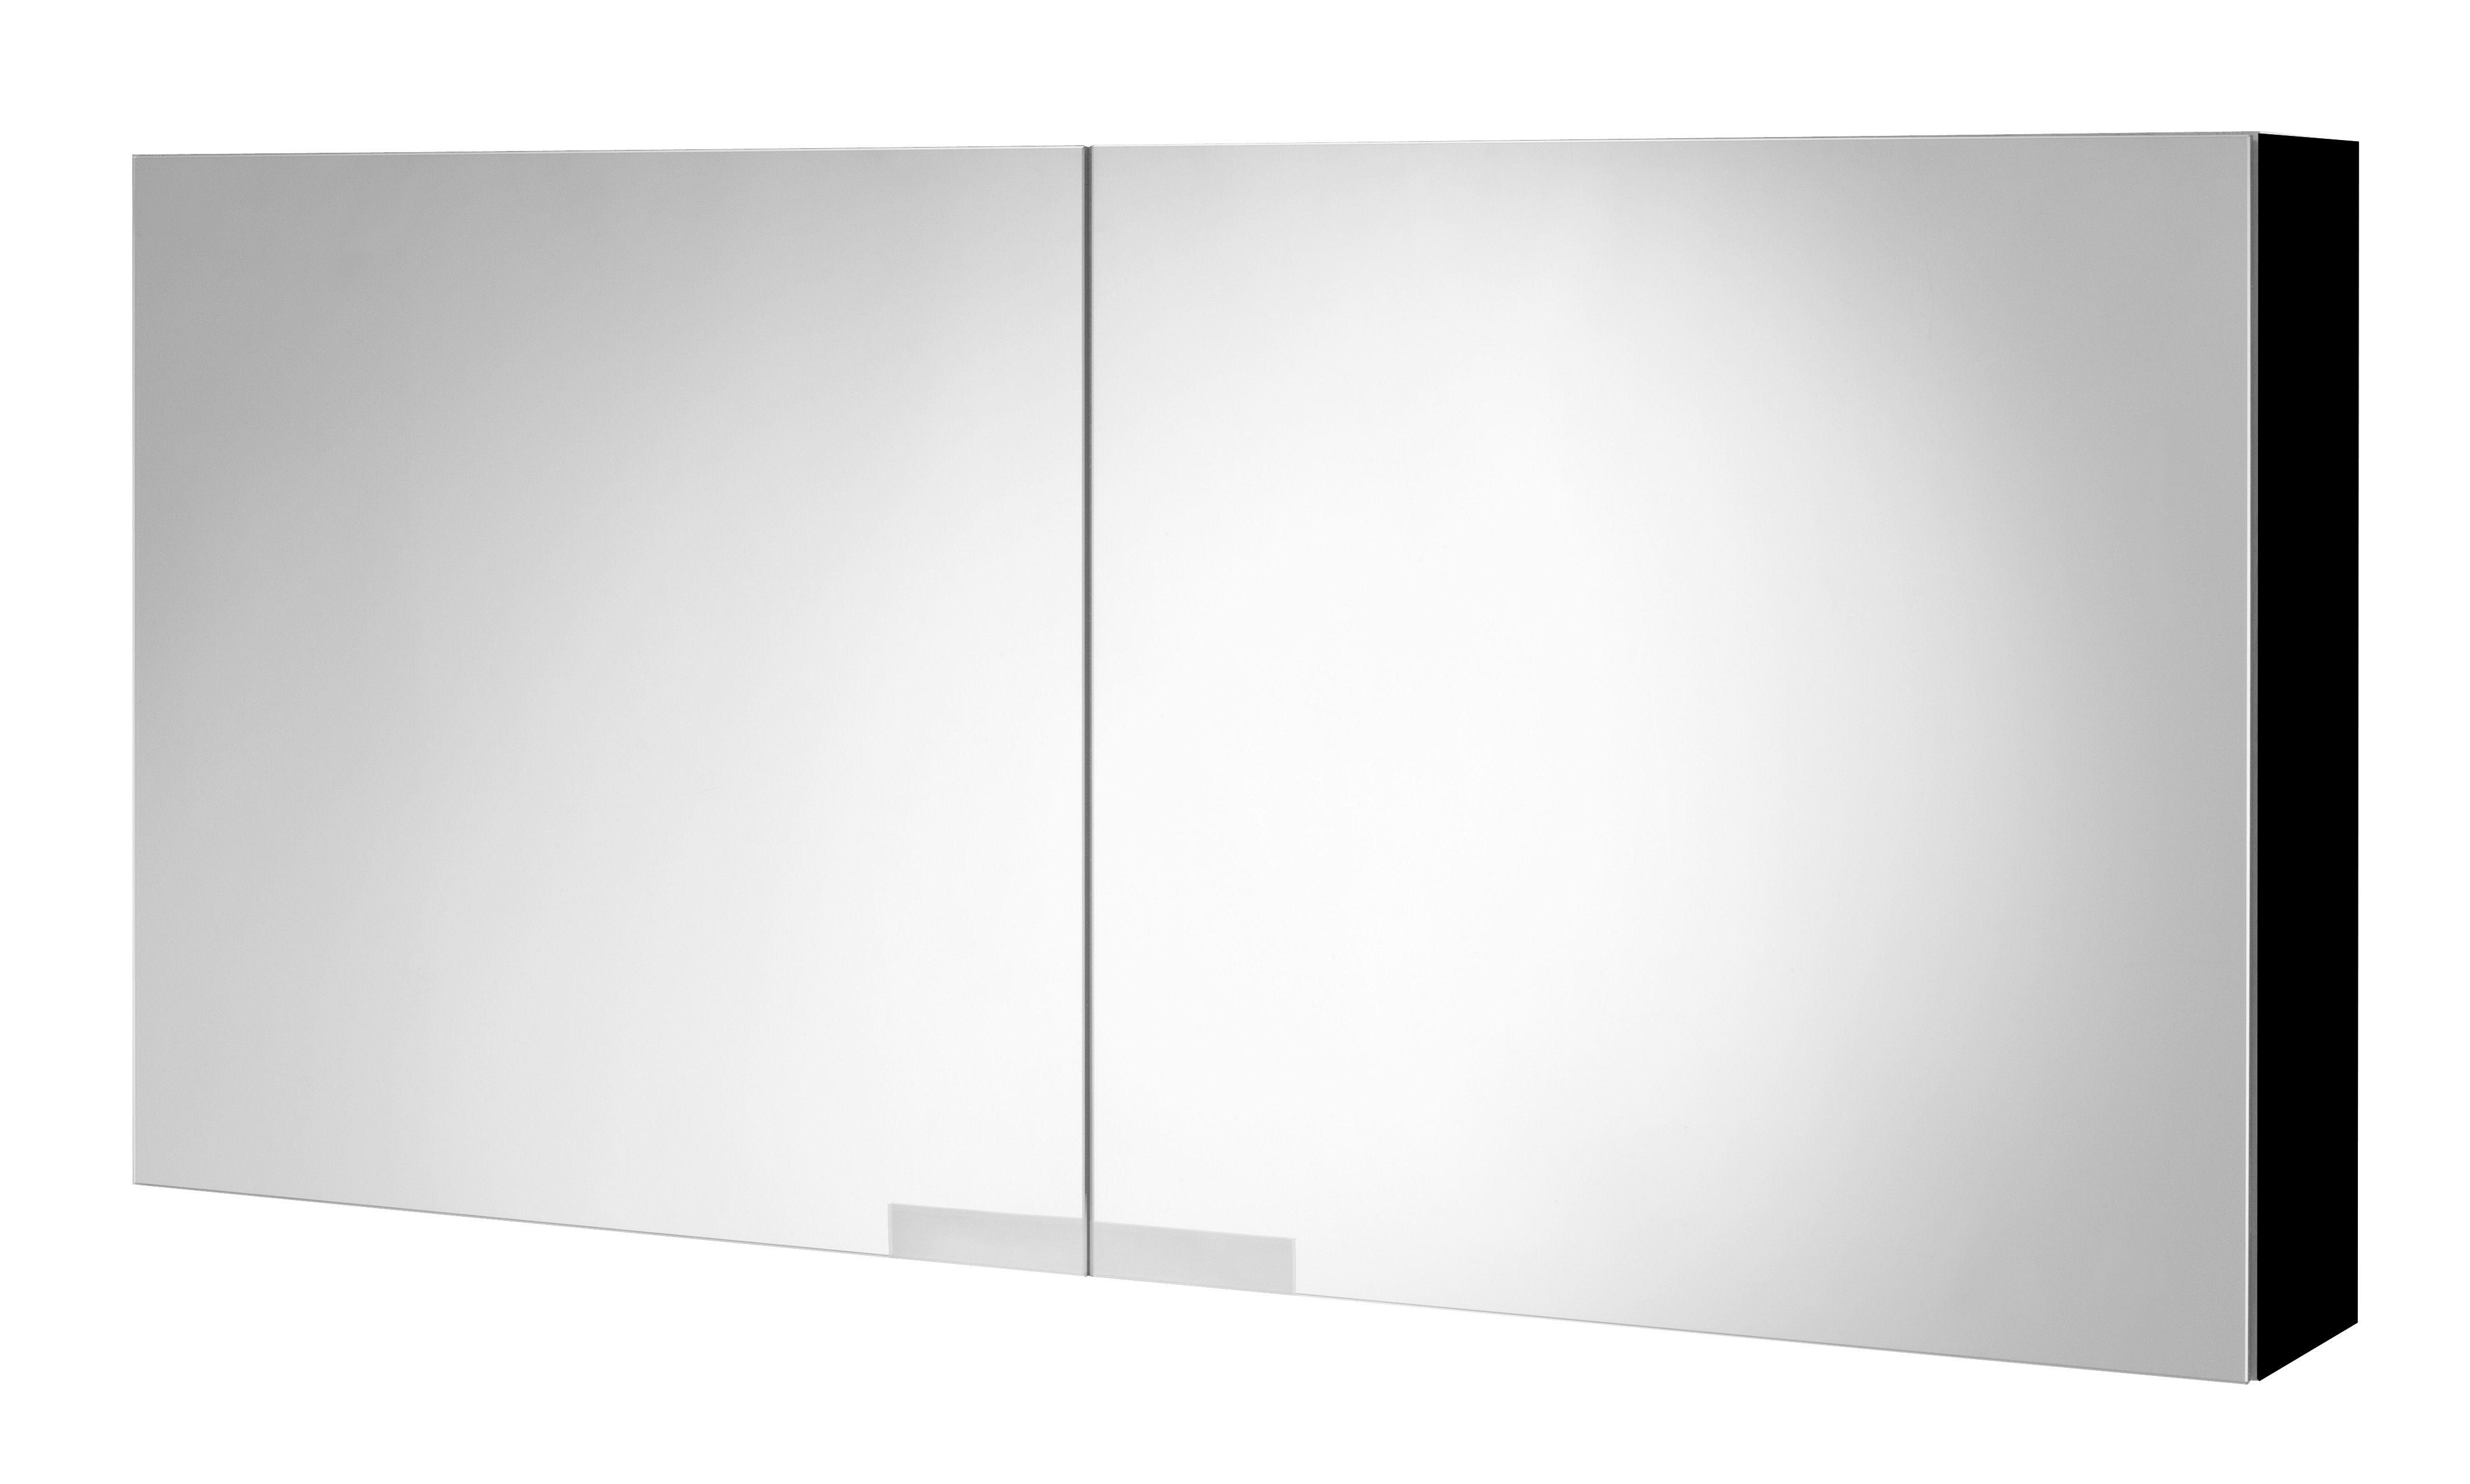 Tiger Items spiegelkast 105 x 50 cm, zwart hoogglans